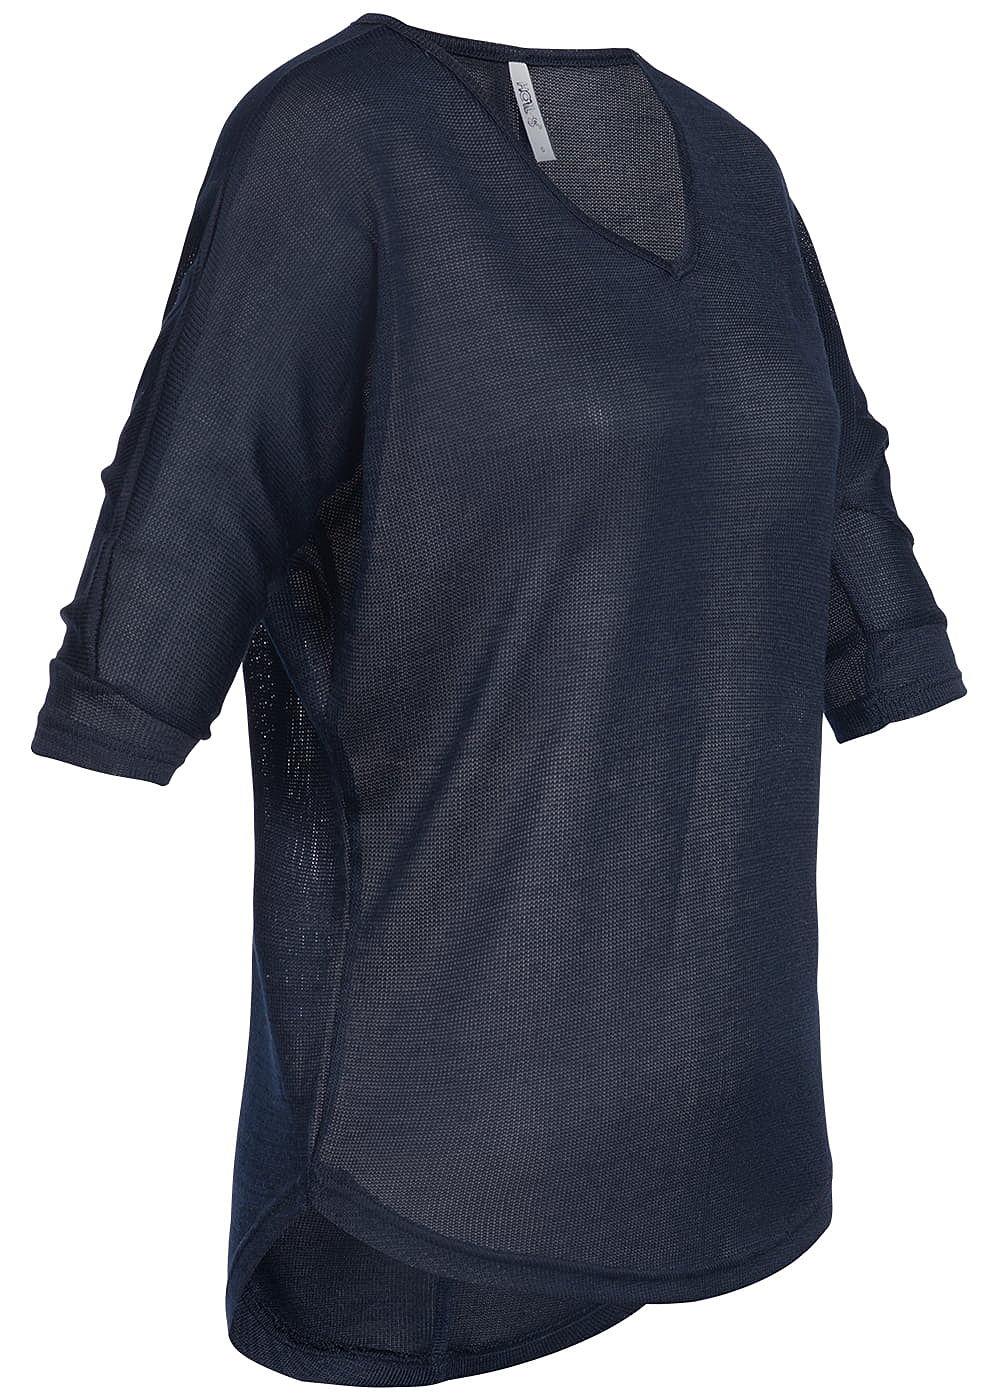 2bdc0f097d047a Hailys Damen 3 4 Sleeve Shirt navy blau - 77onlineshop